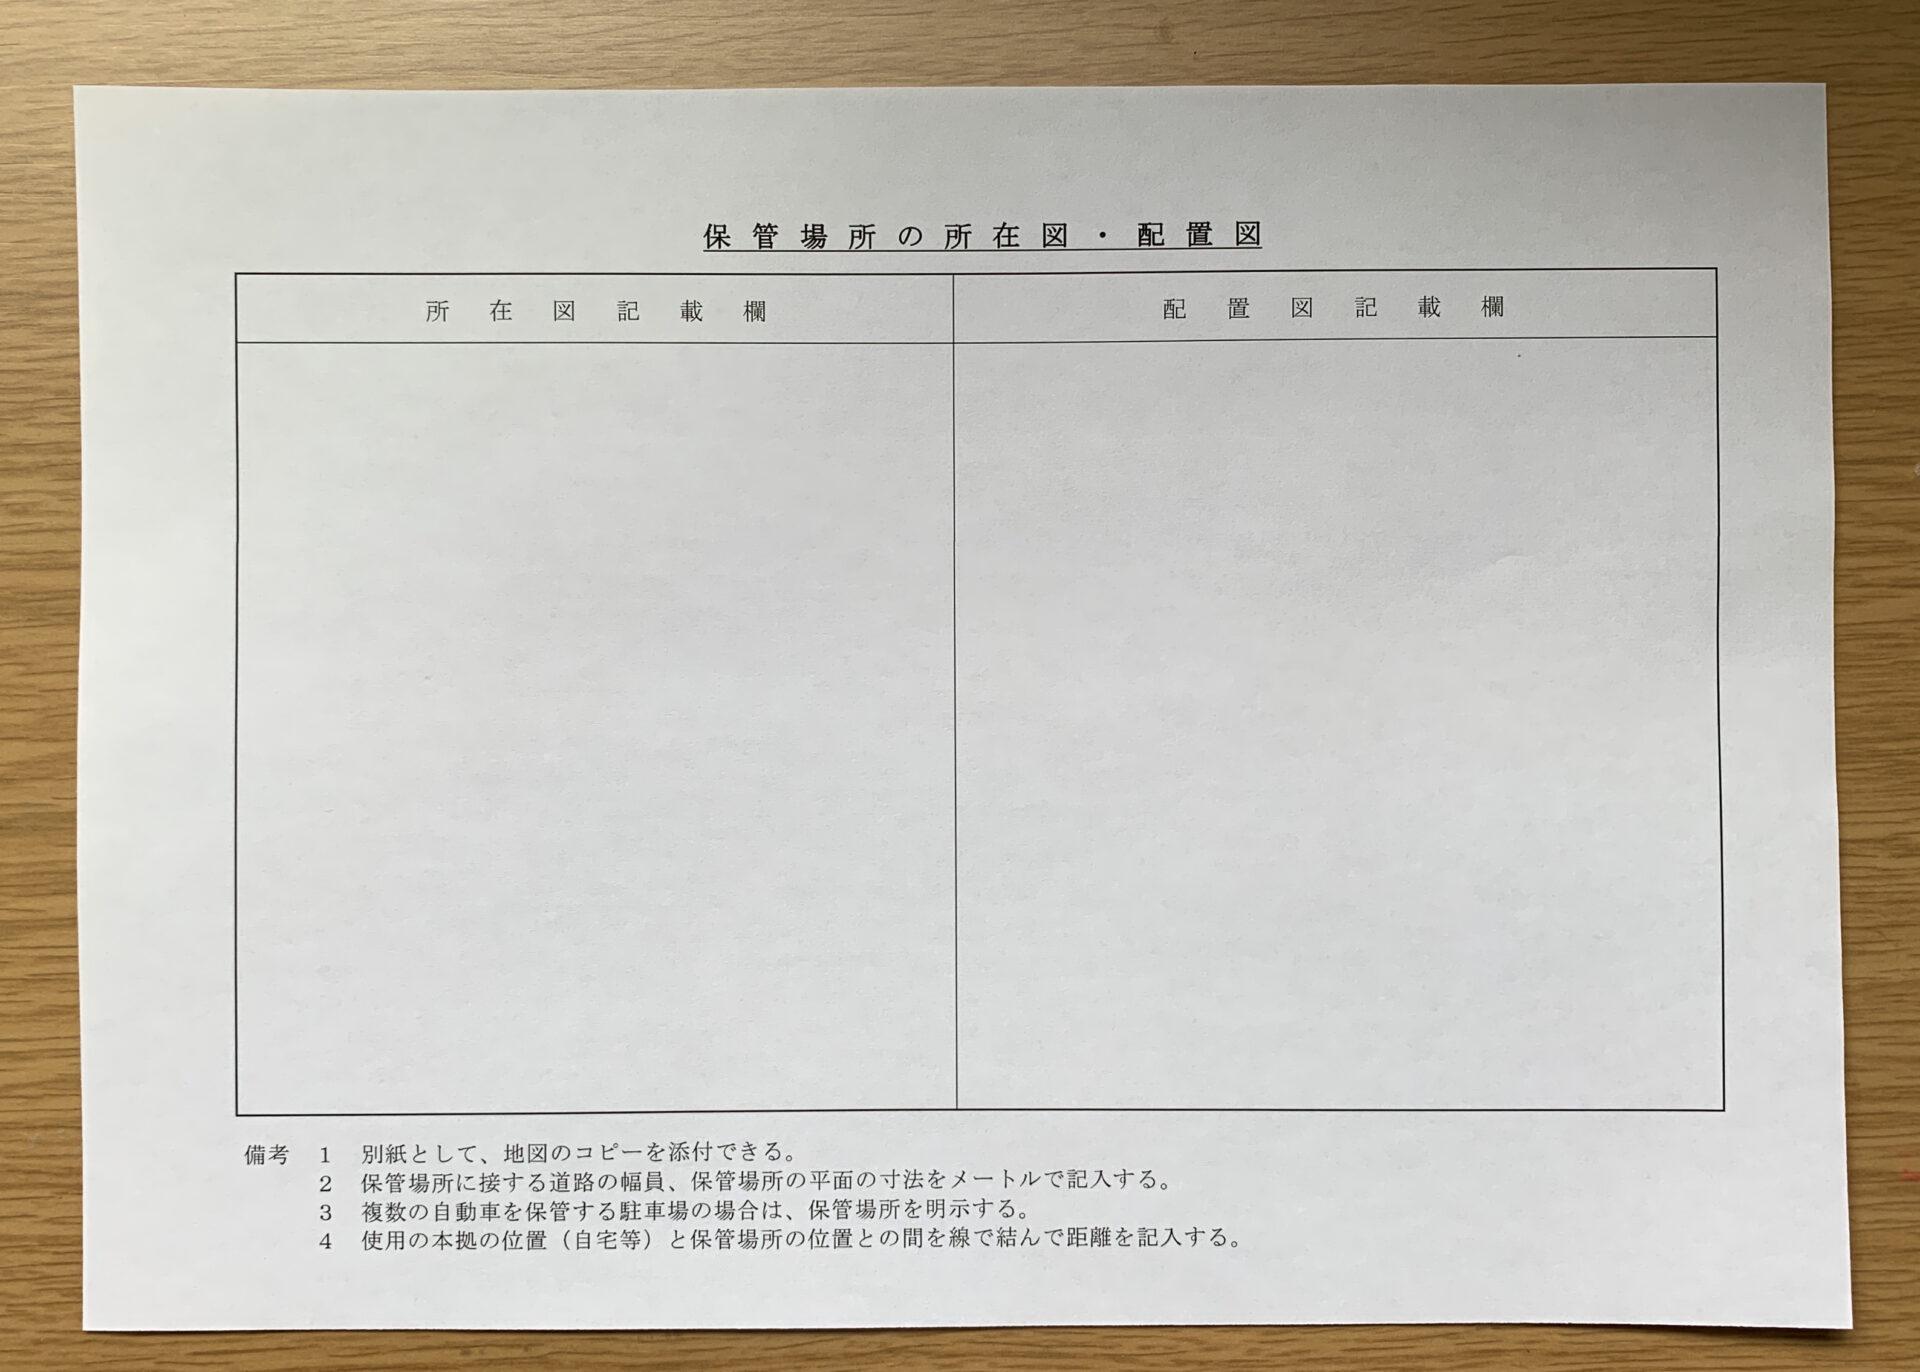 車庫証明 保管場所の所在図・配置図の書き方